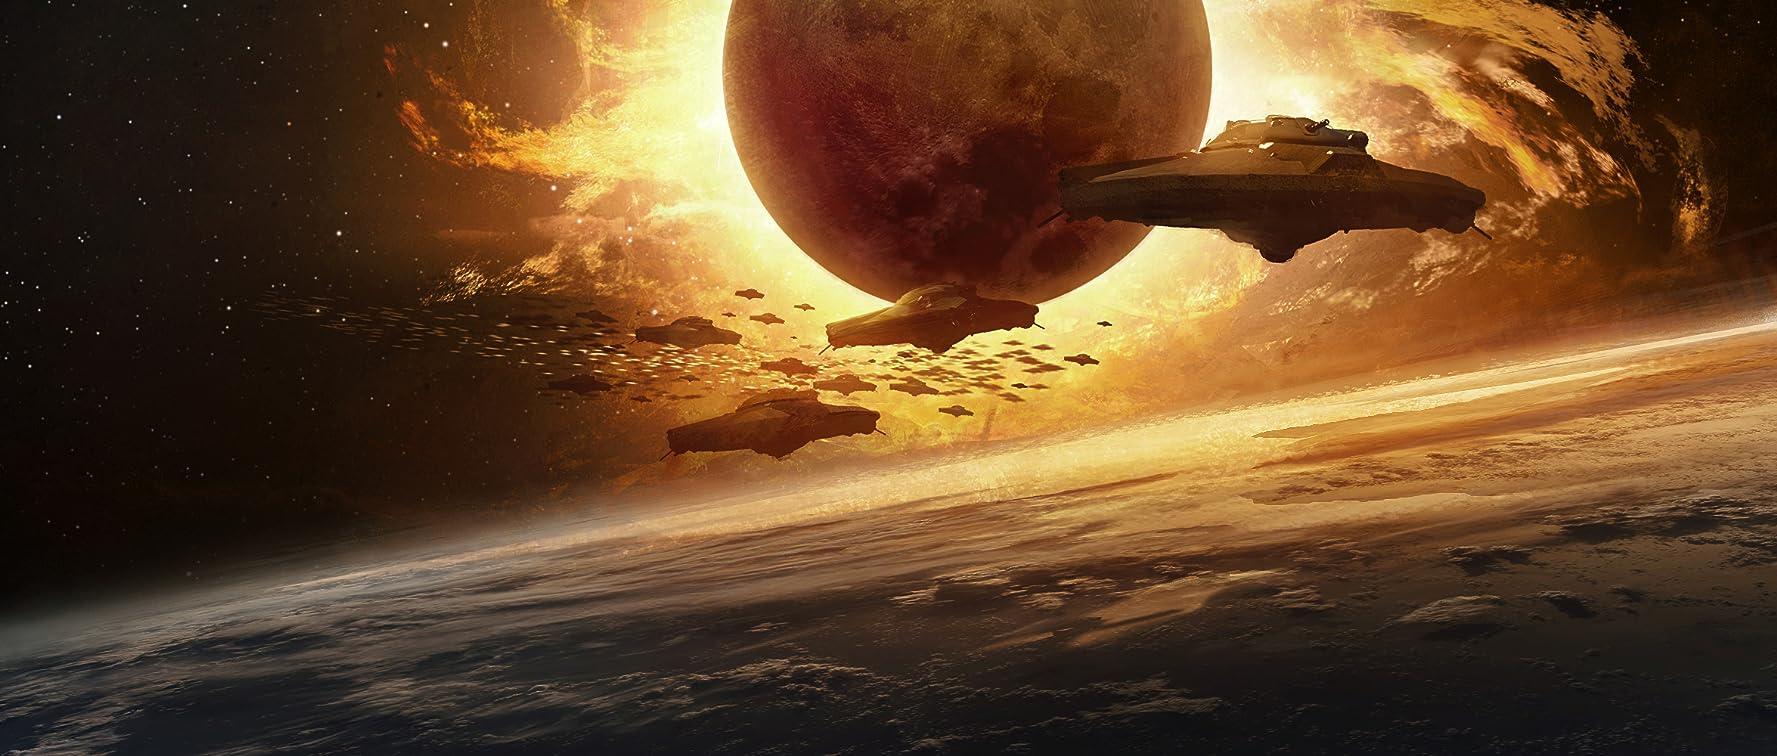 Invazia - Iron Sky (2012) Online Subtitrat in Romana